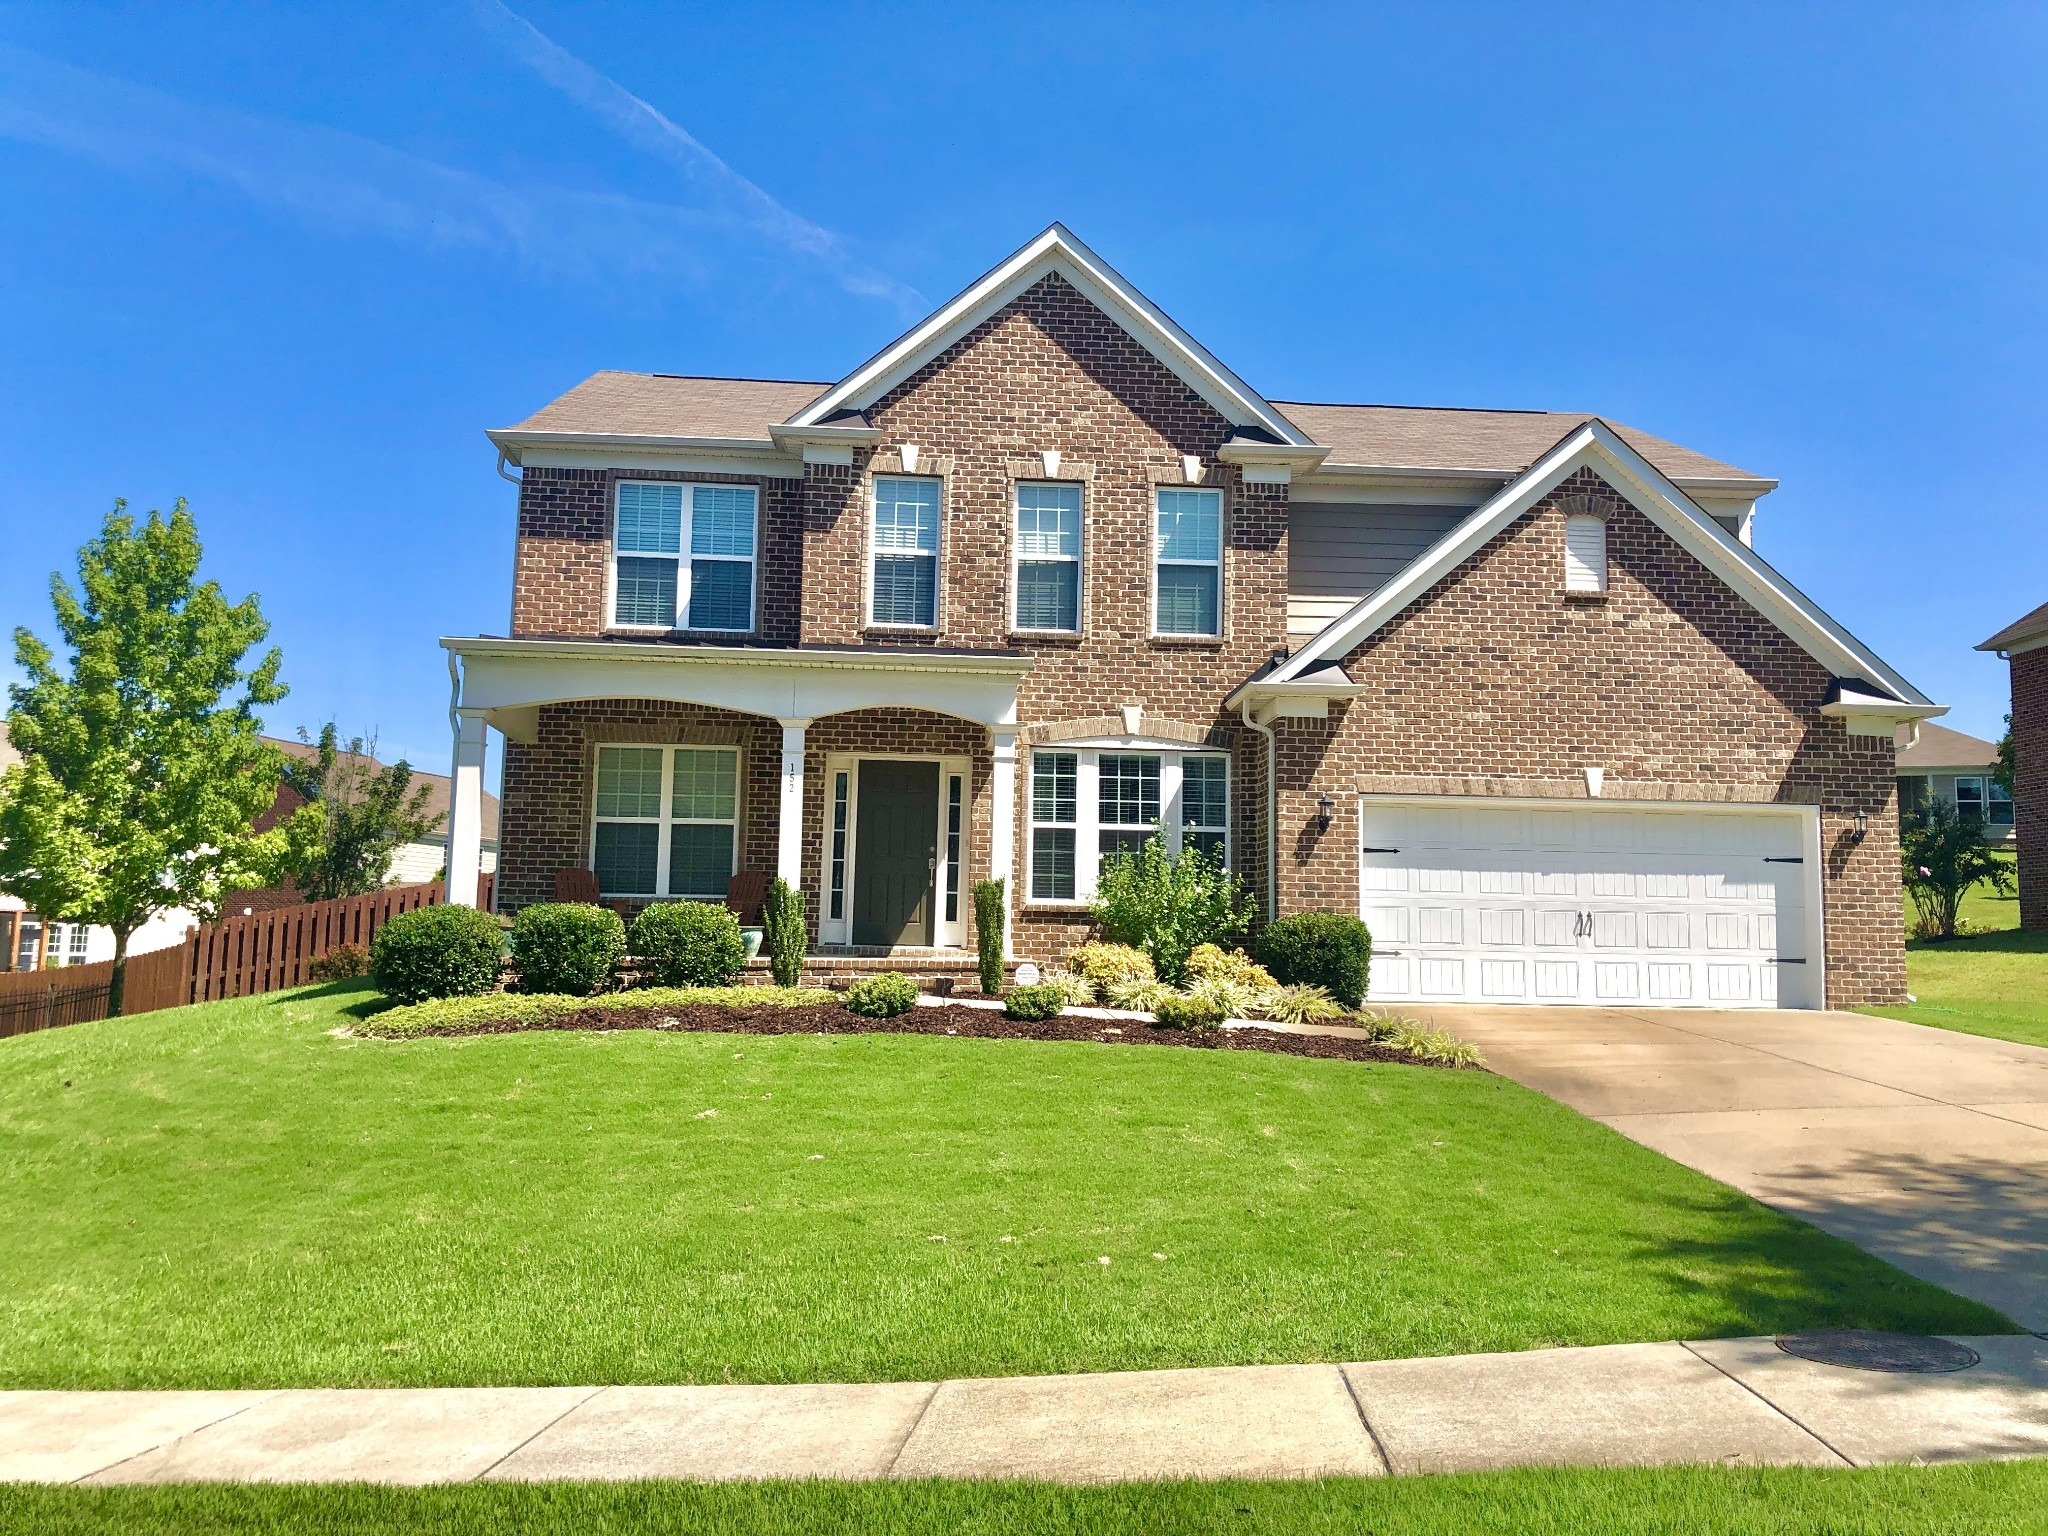 152 Creekstone Blvd Property Photo - Franklin, TN real estate listing